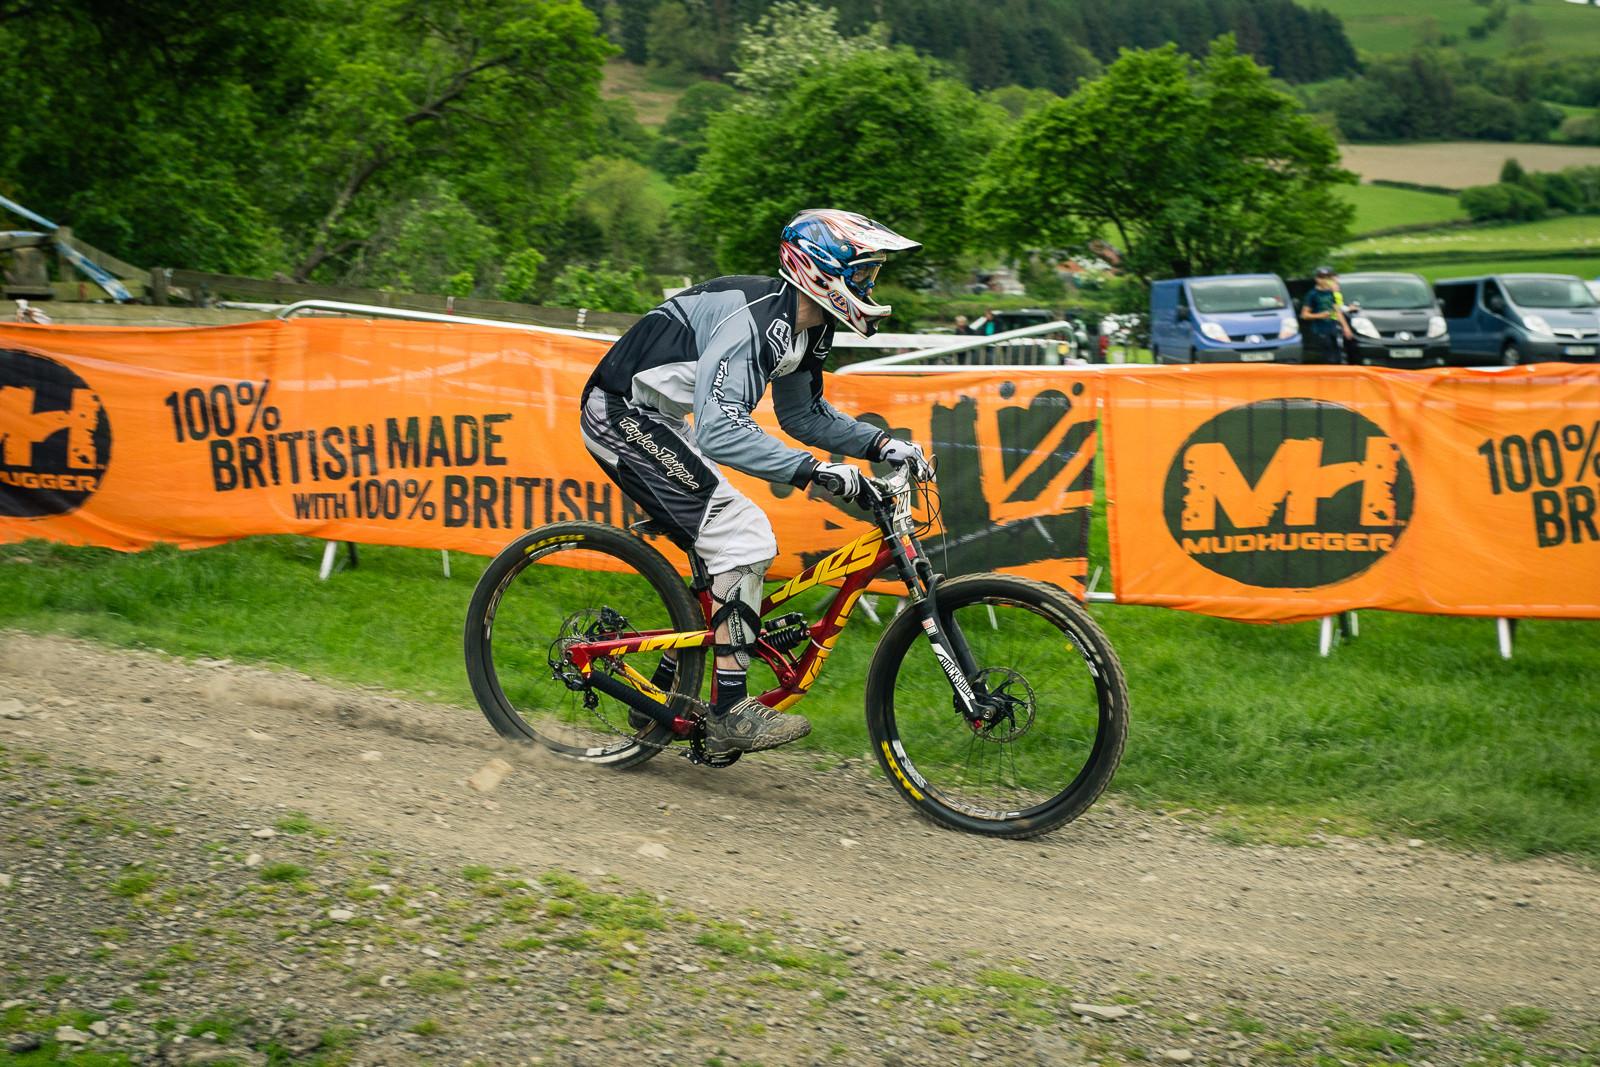 YT Tues AL G-ed Out at Llangollen - G-Out Project - Llangollen BDS 2015 - Mountain Biking Pictures - Vital MTB